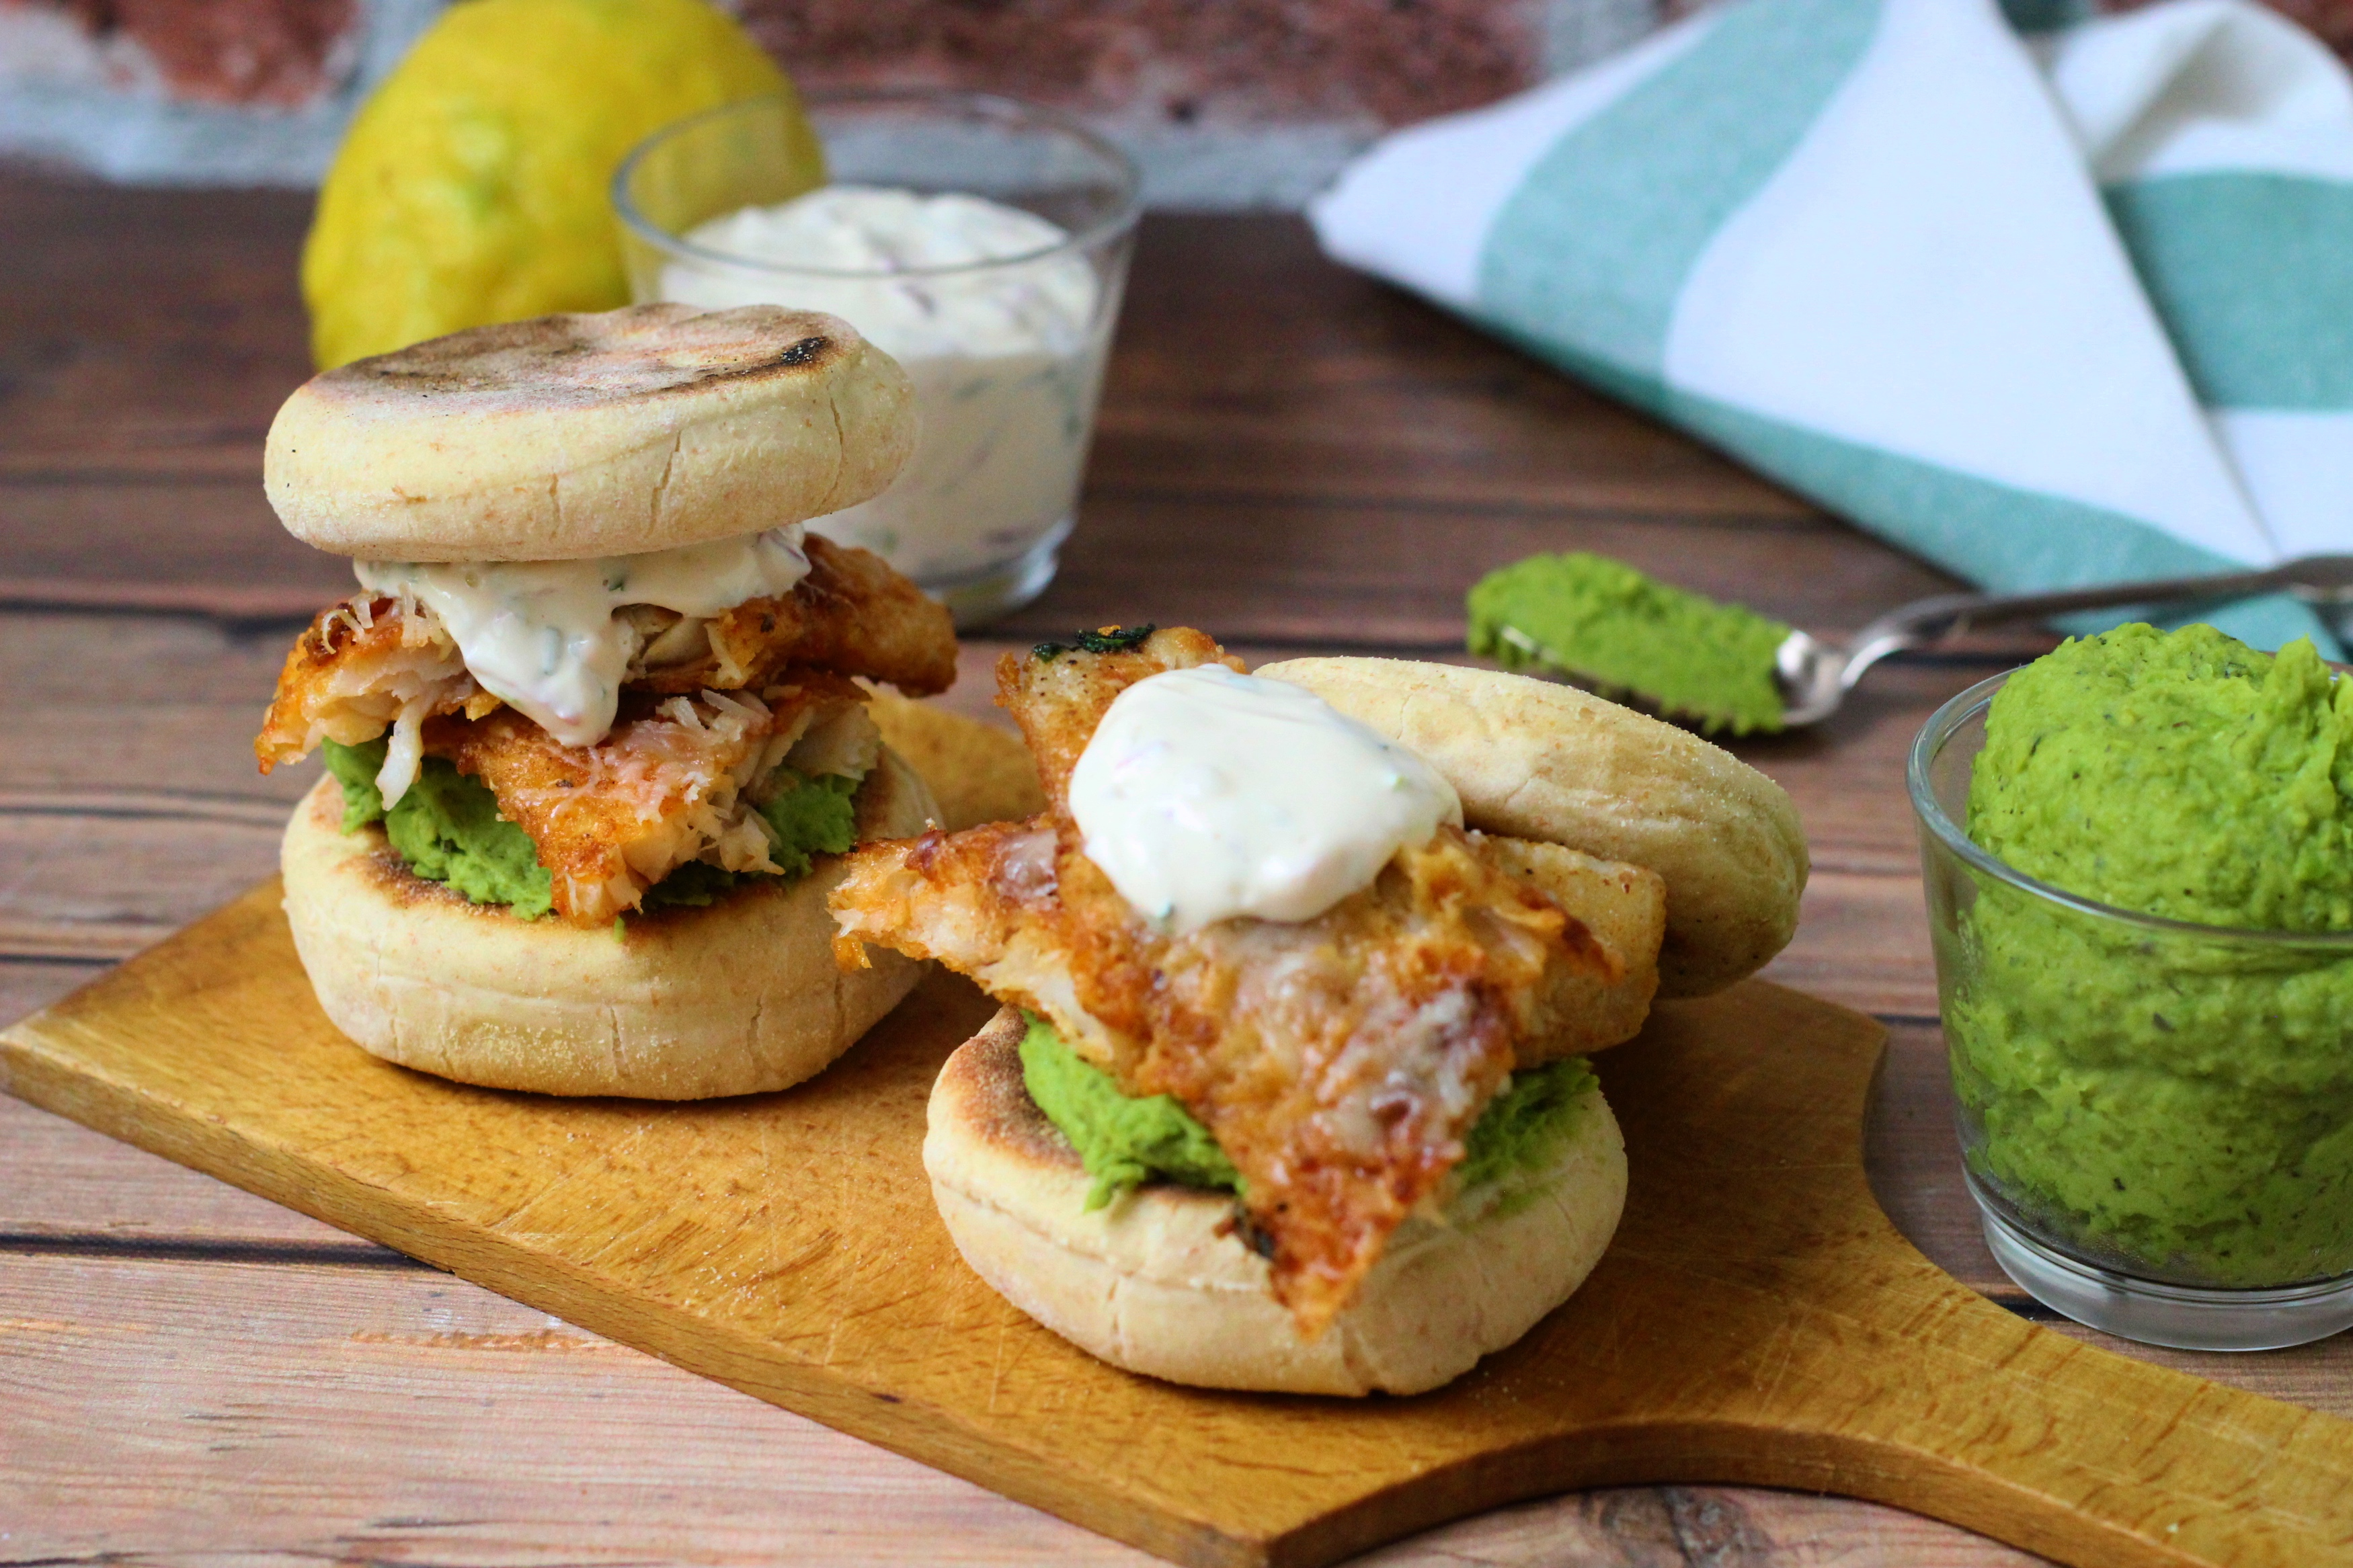 Bundázott hal angol muffinnal - A fish burger és a fish and chips keveréke